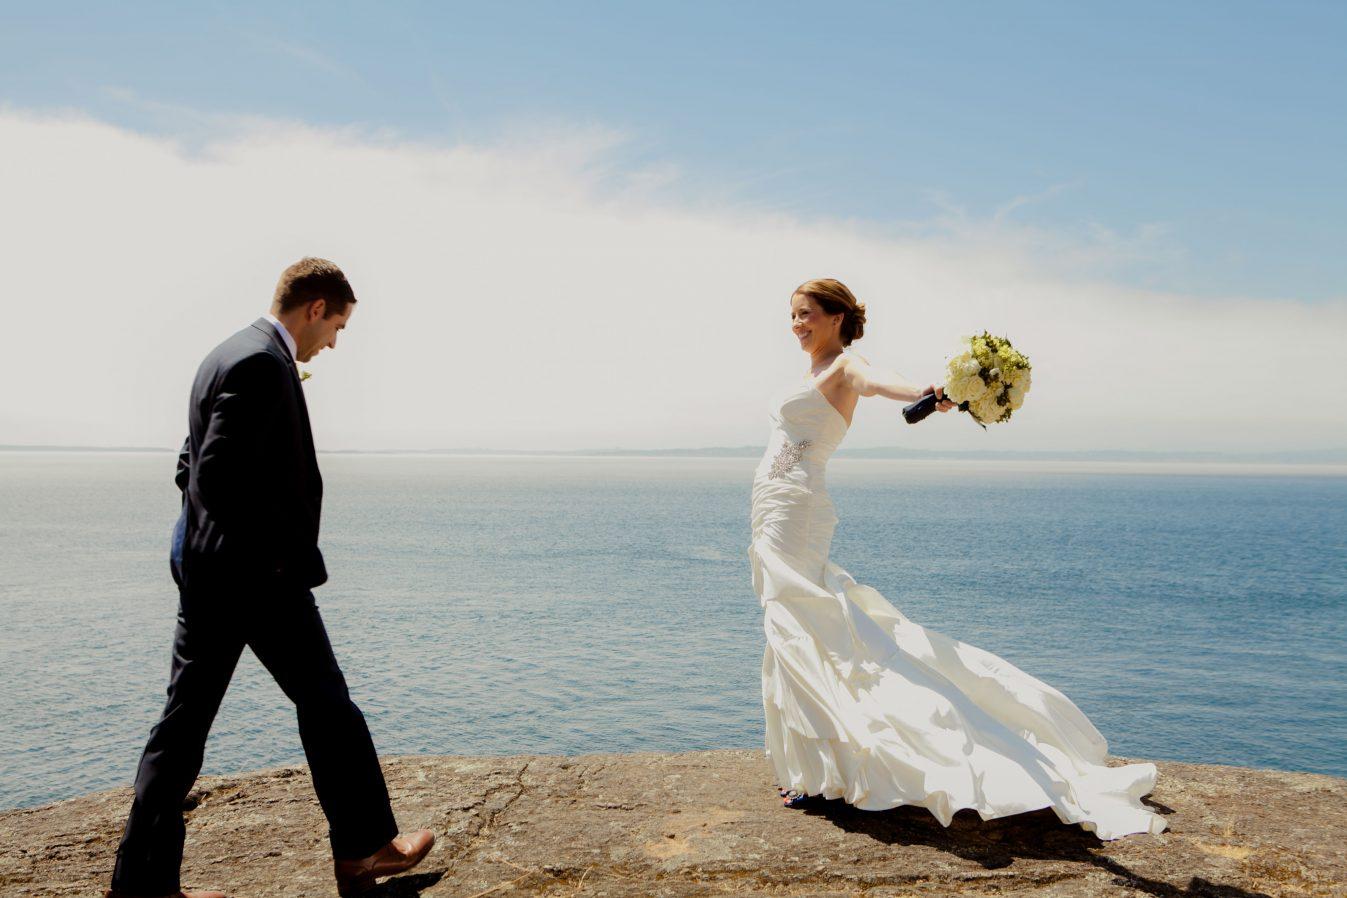 bride-groom-water-spontaneous-wedding-photo